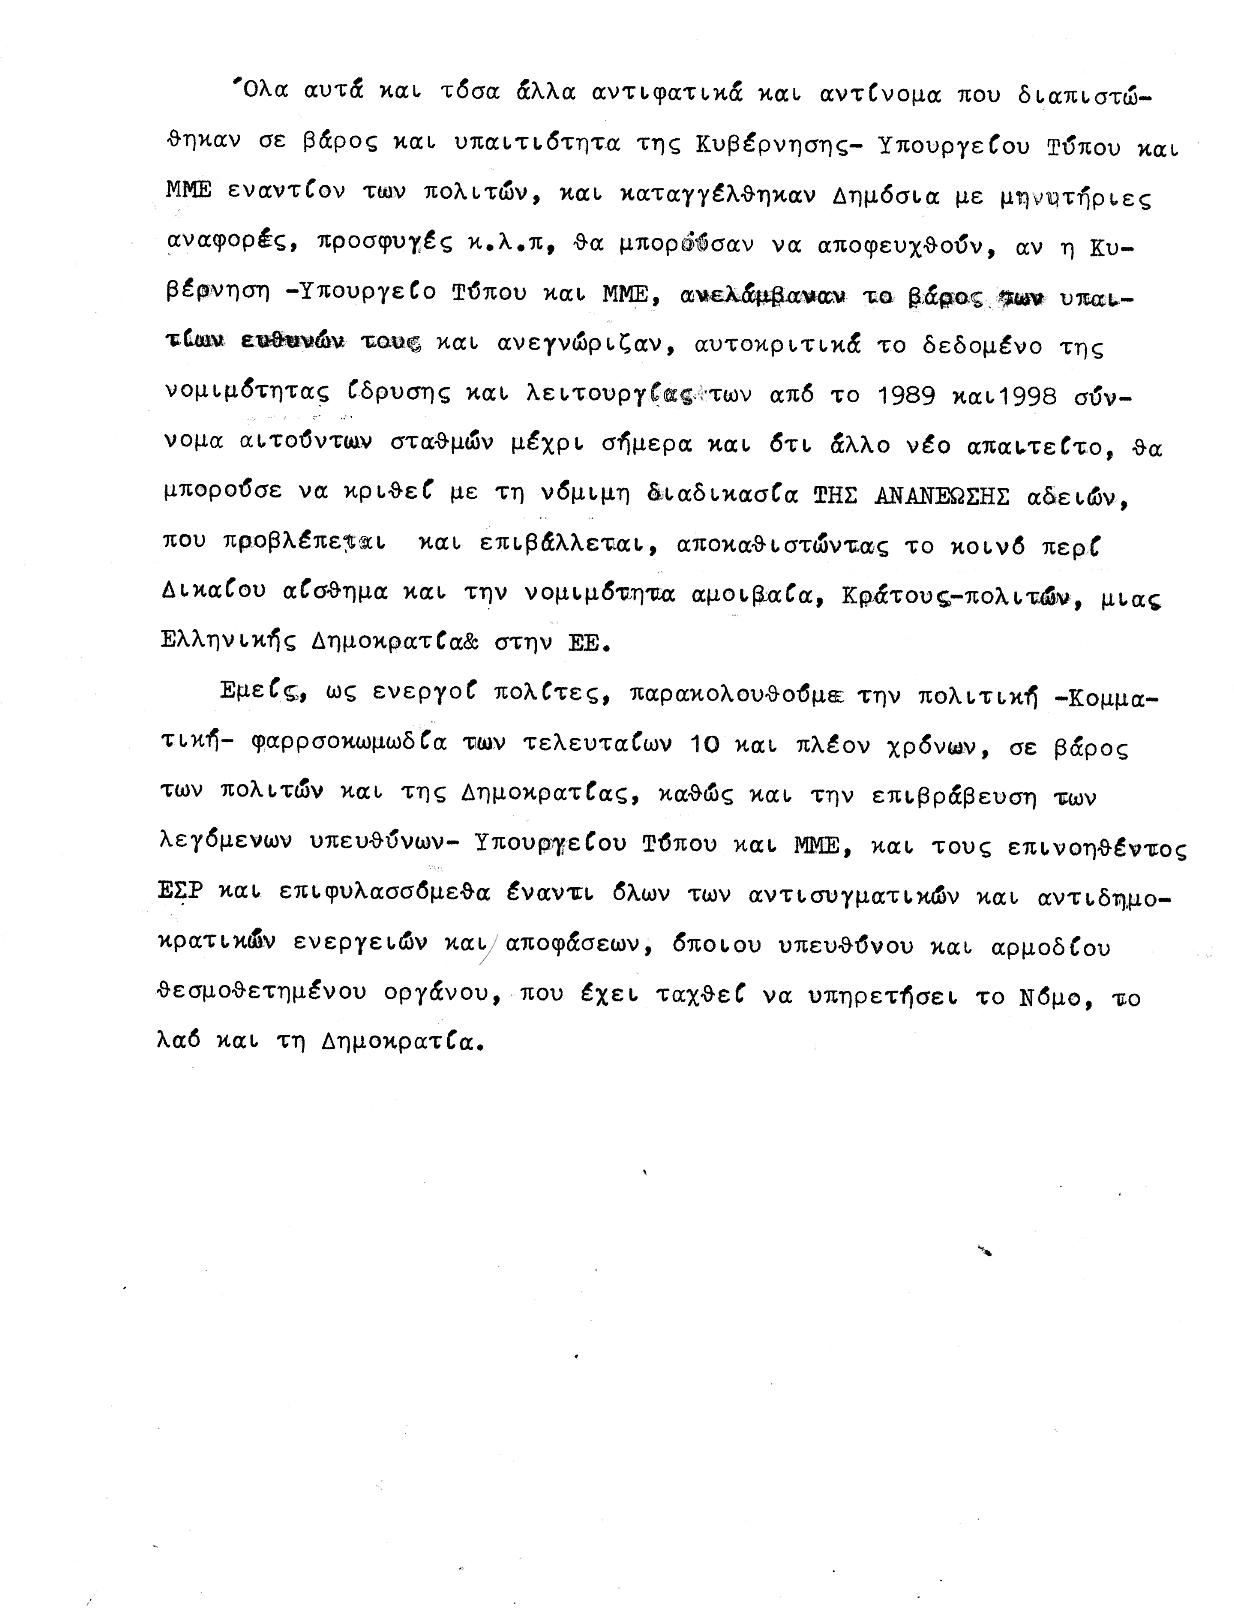 afieroma-gioldasis-5